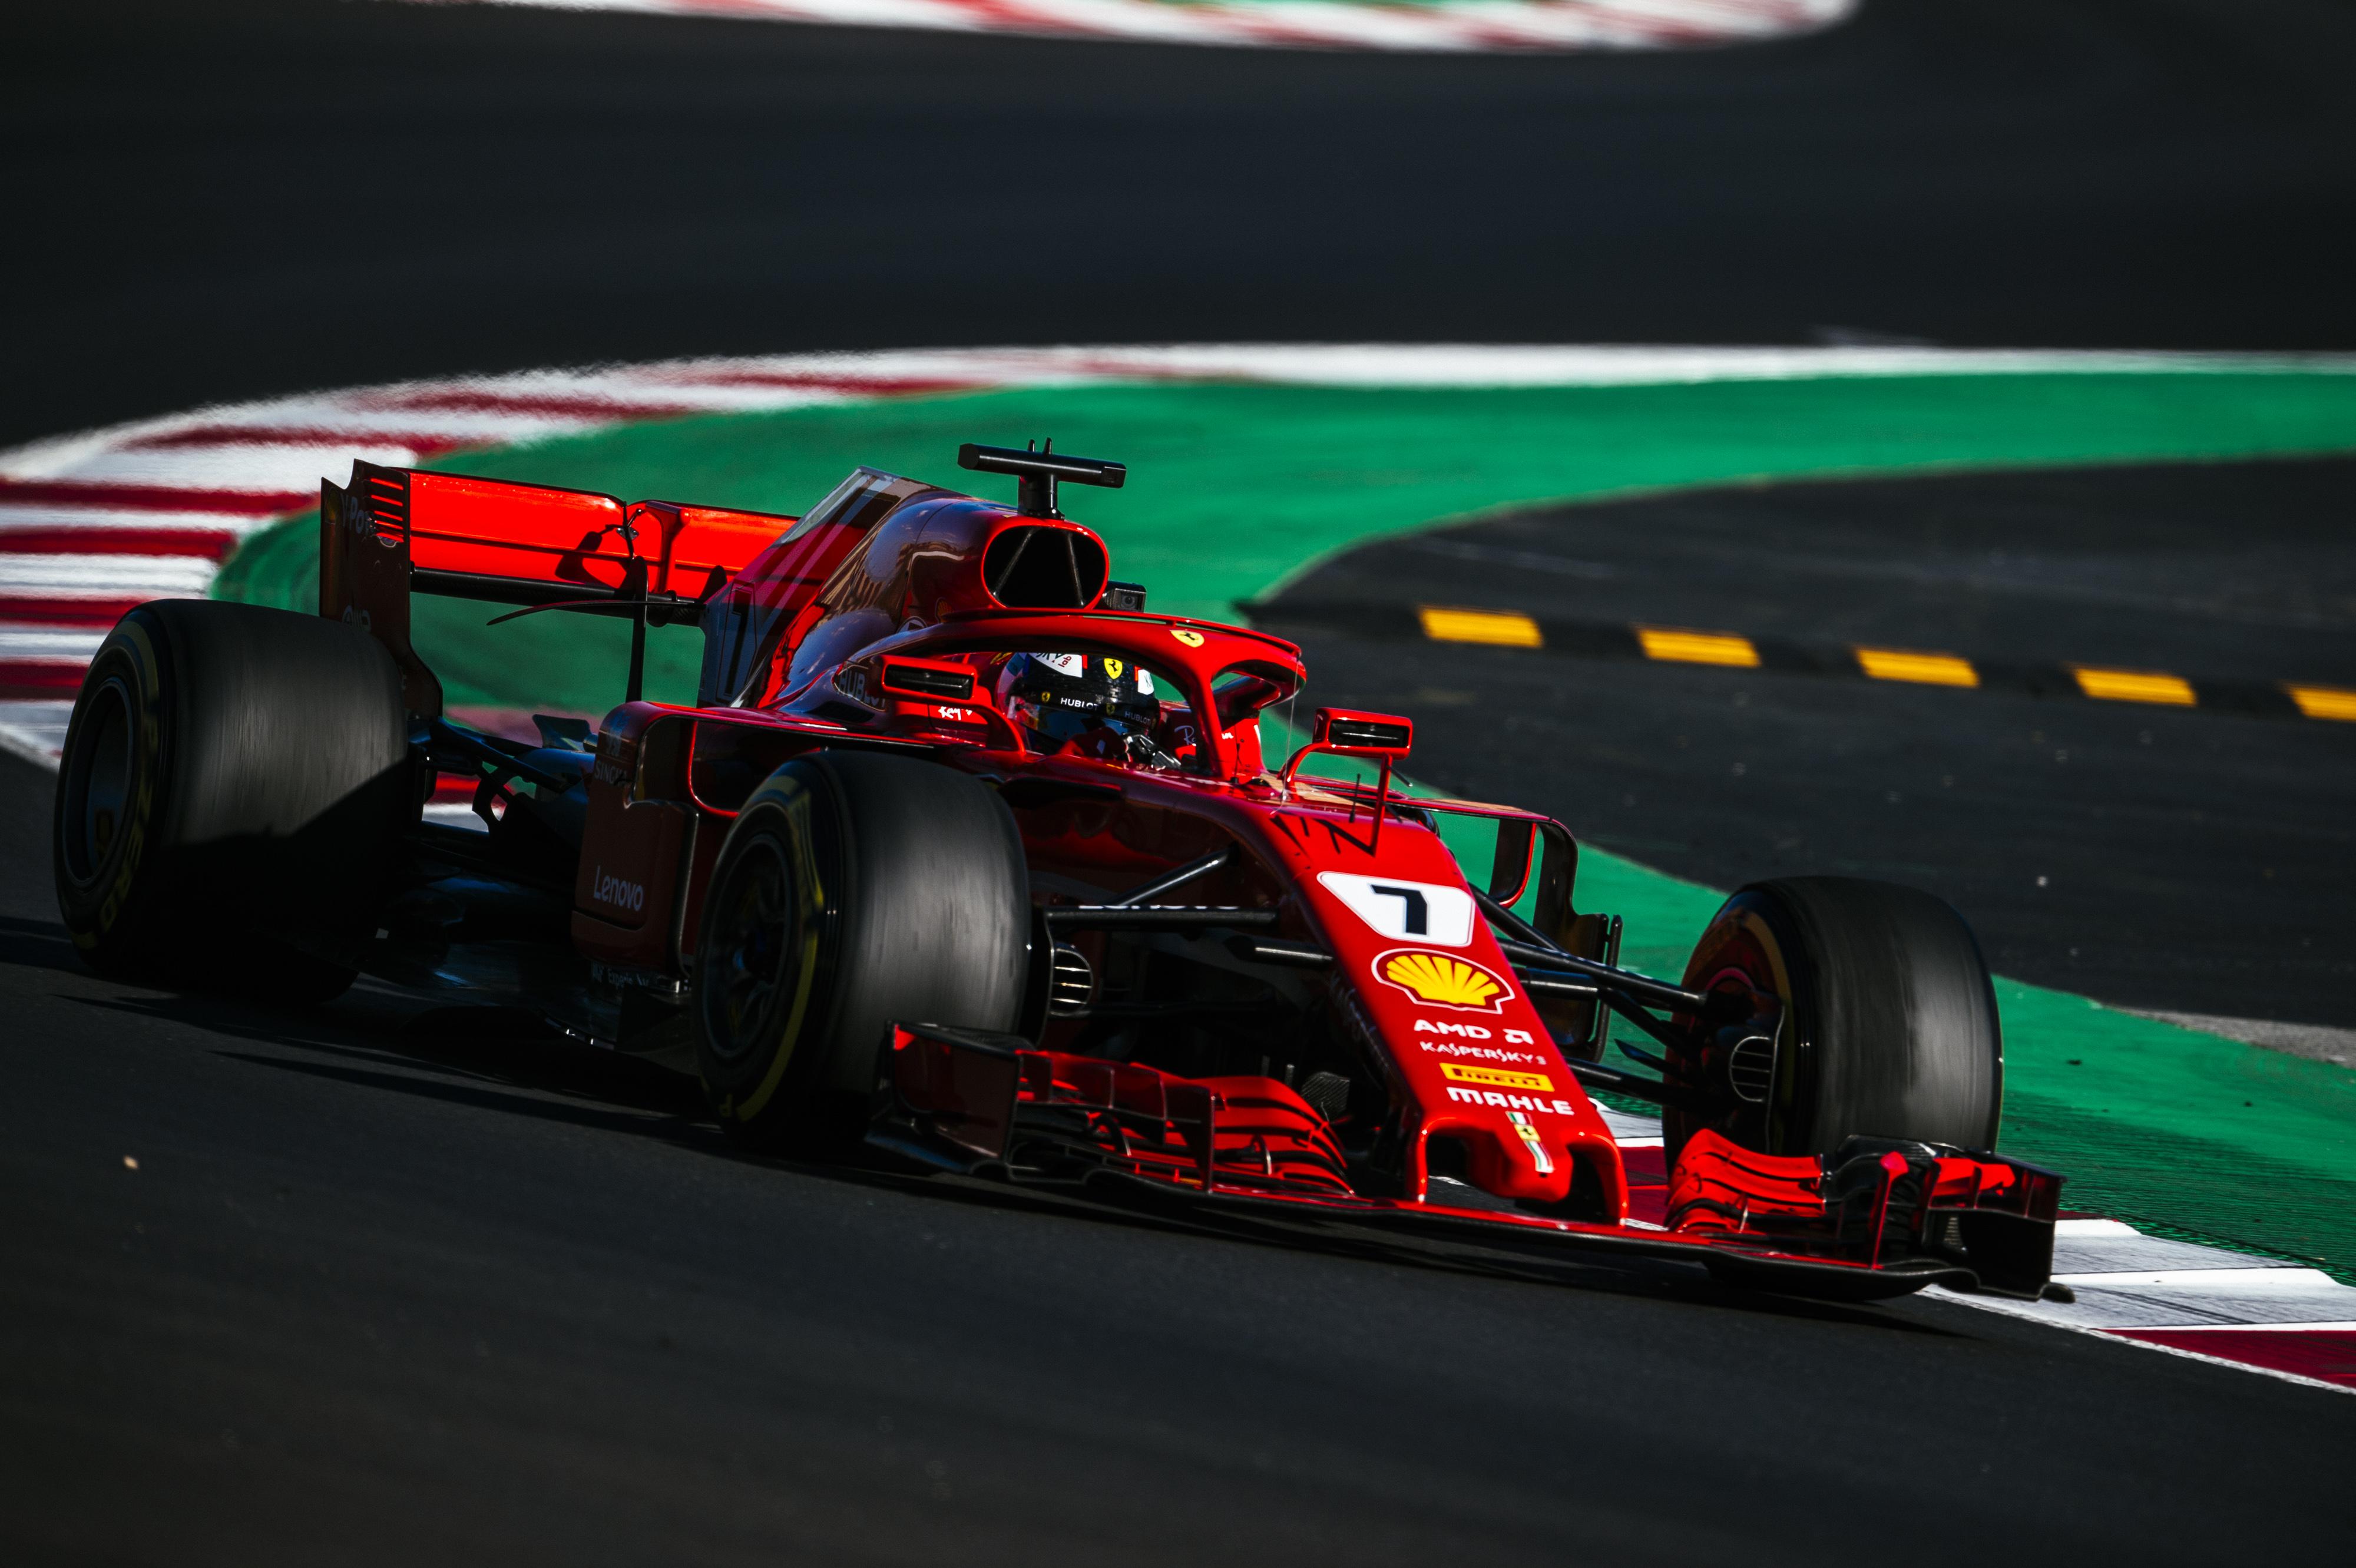 F1 testing: Raikkonen leads Alonso on final day – ThePitcrewOnline